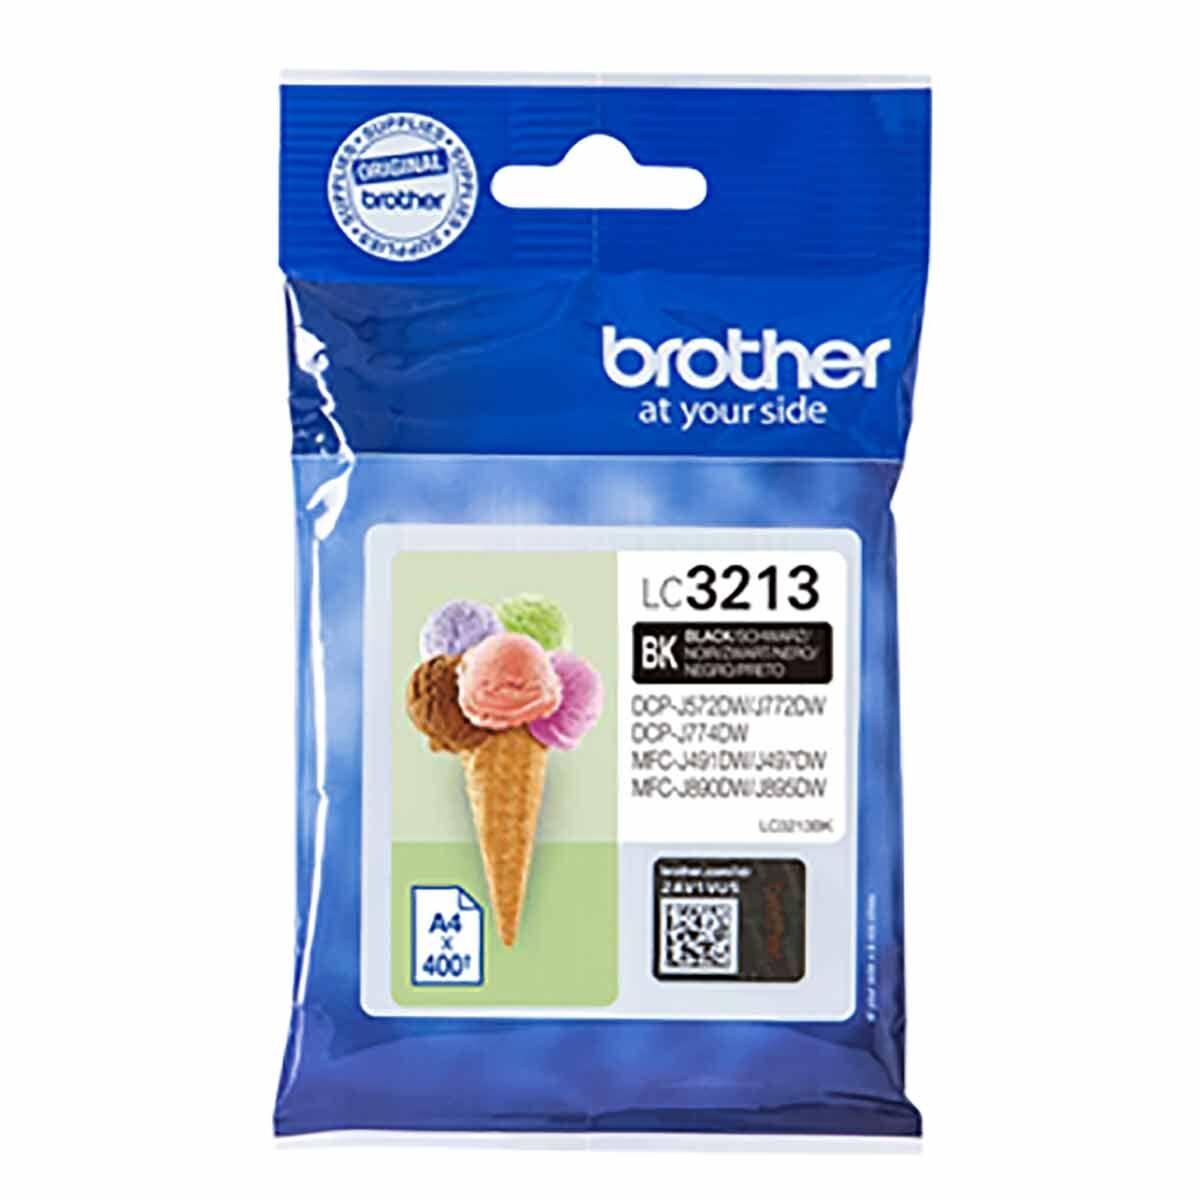 Brother LC3213BK Black Original Ink Cartridge